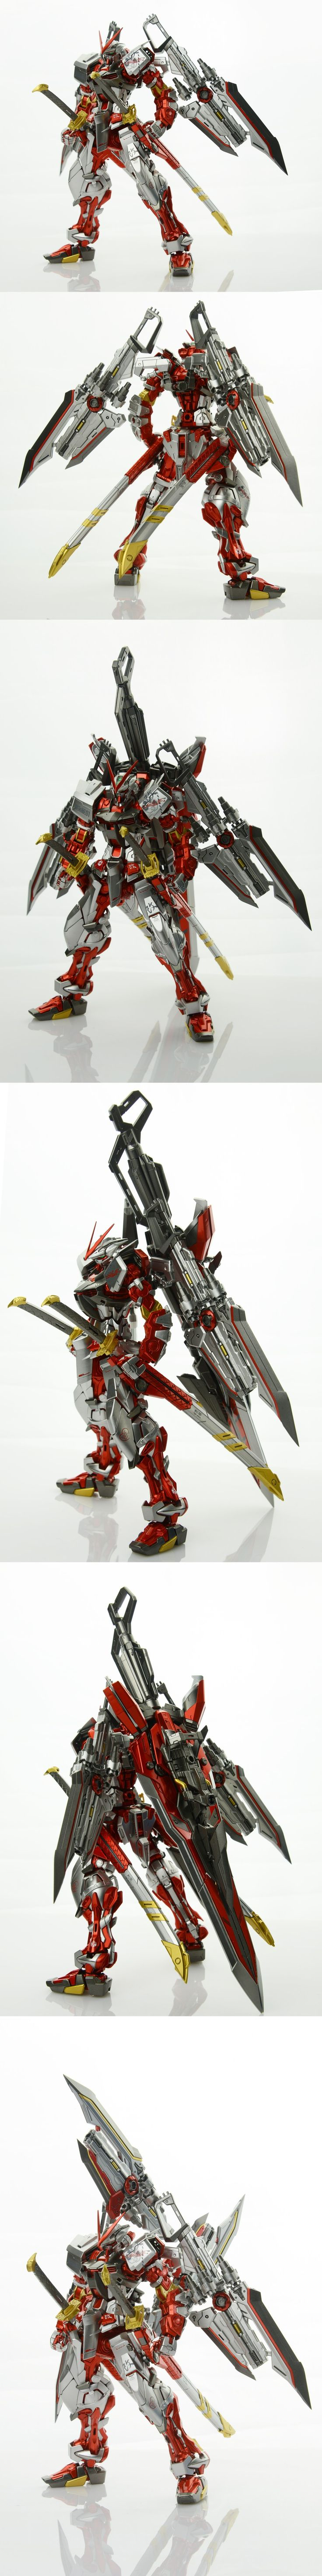 Gundam Astray Red Frame Custom | MG 1:100 scale